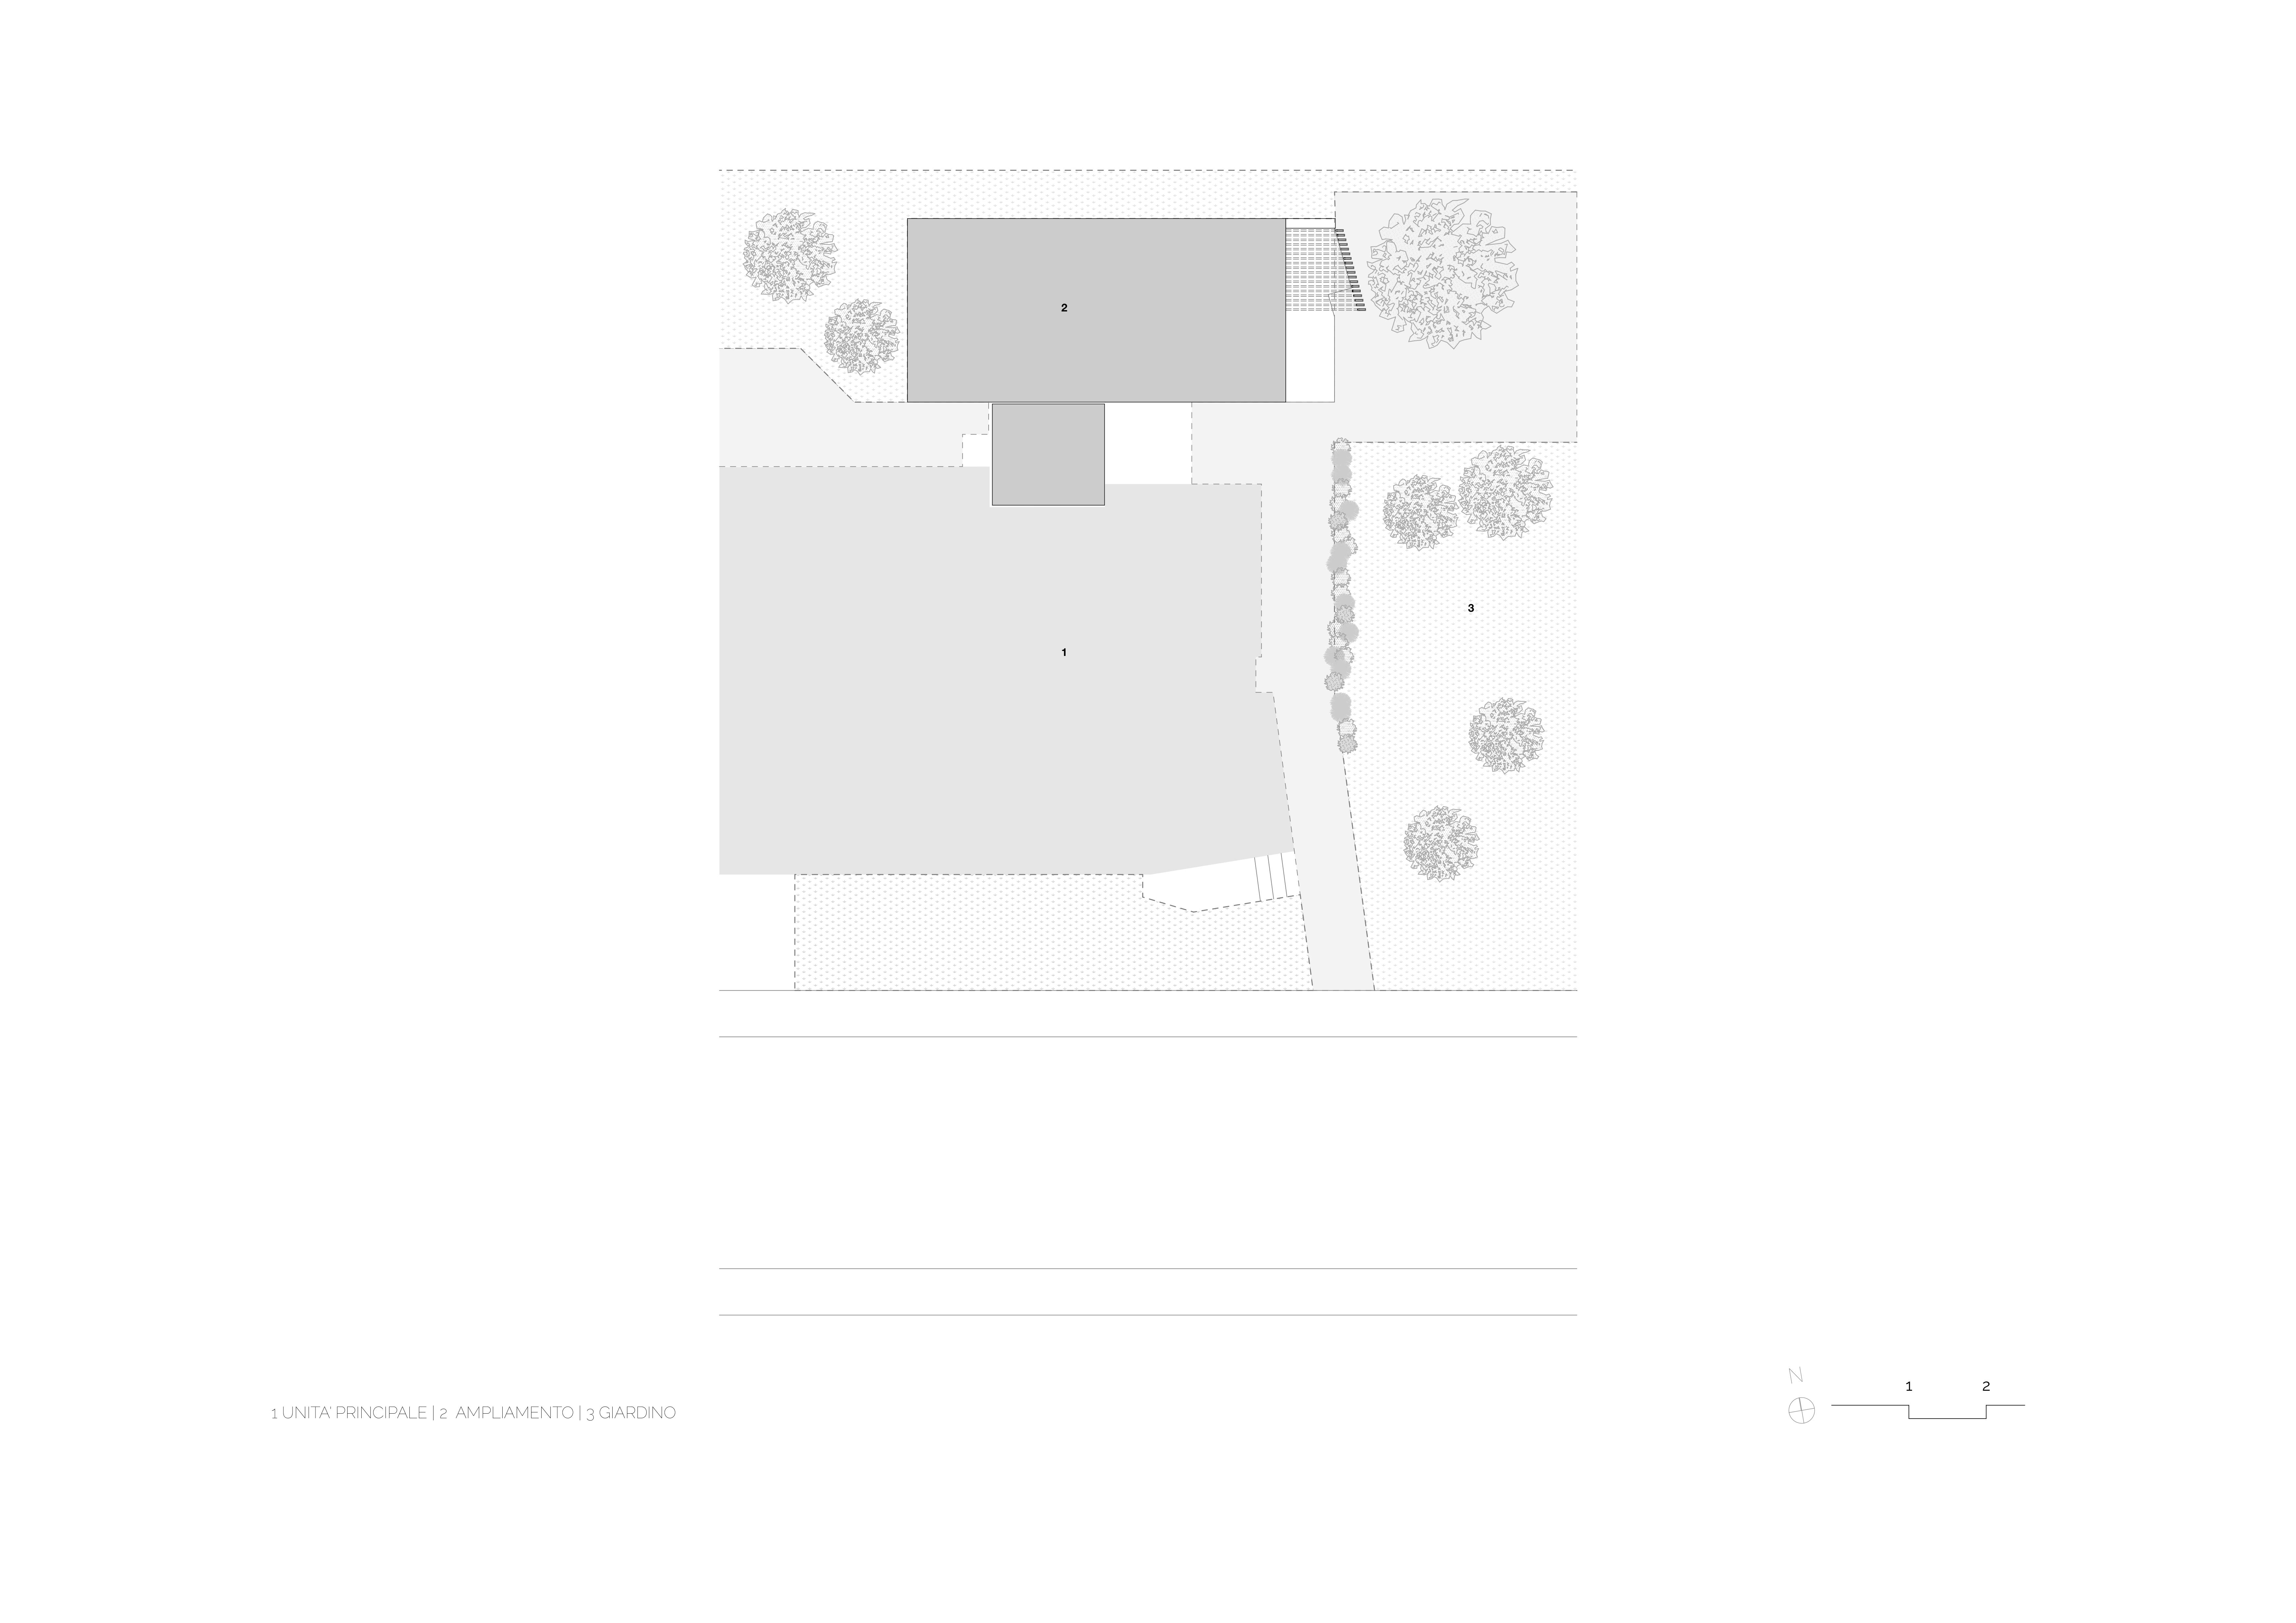 01 casa_rm Planimetria inserimento